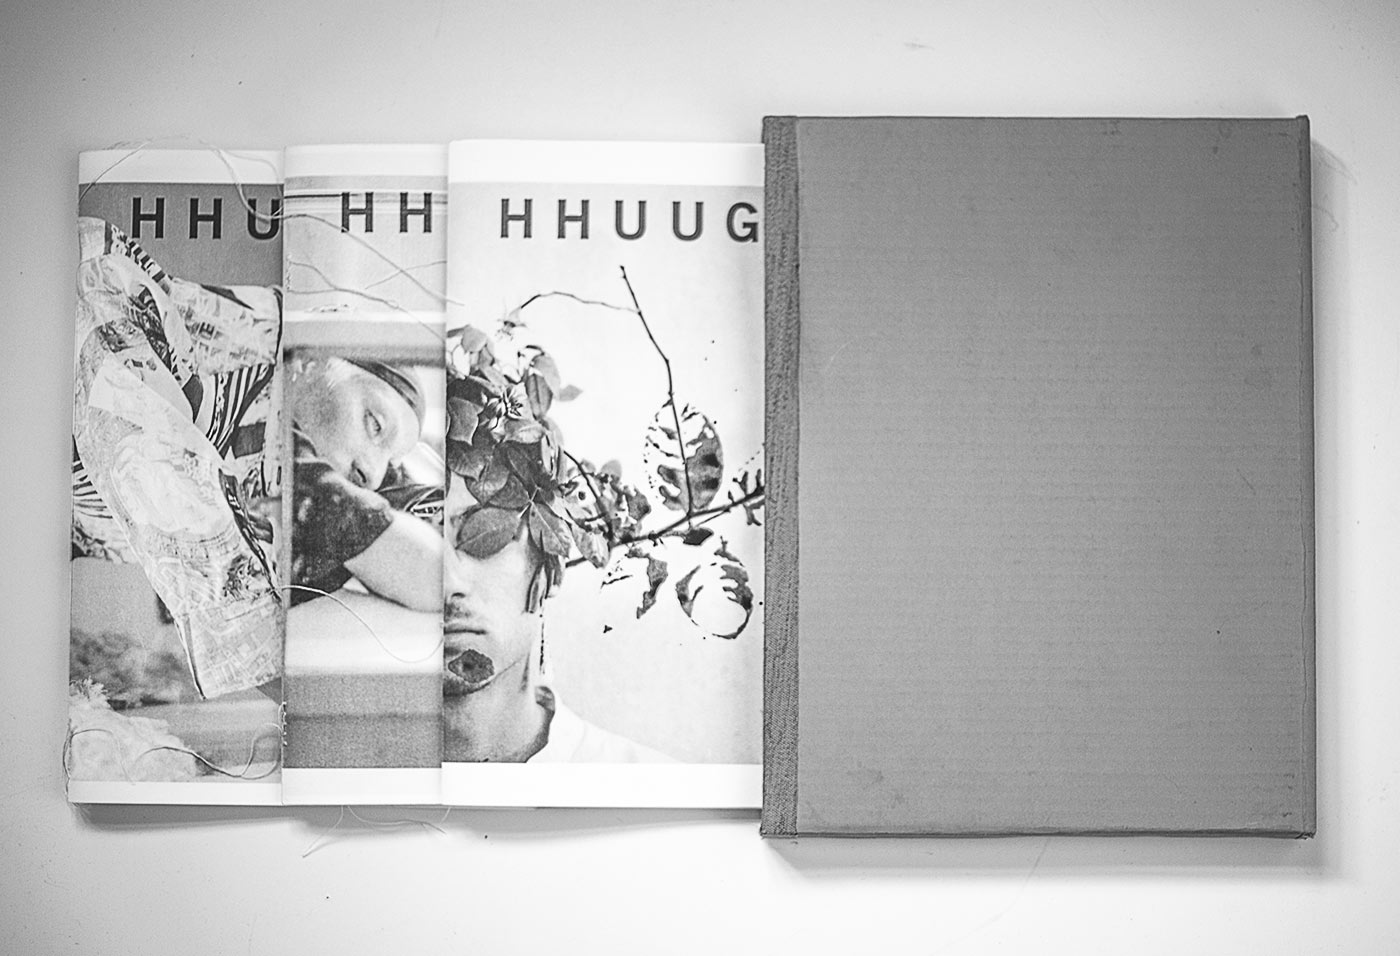 msdm-hhuugg-box